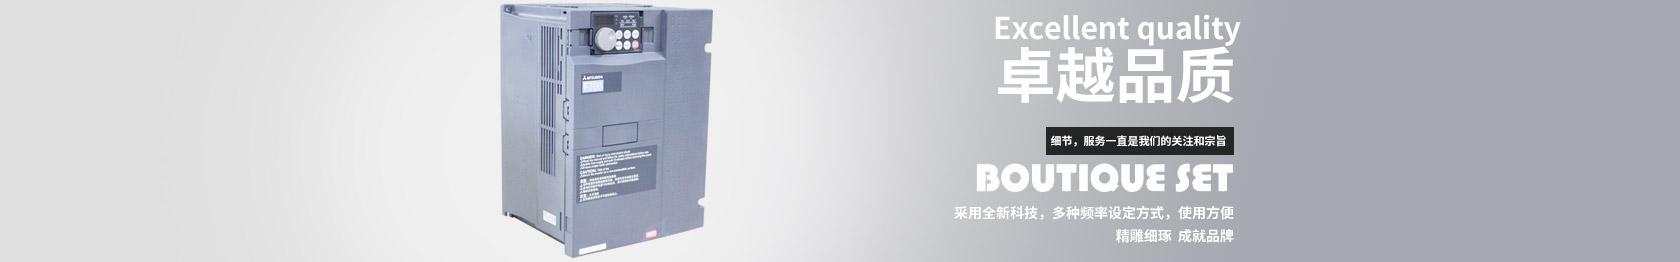 pk10牛牛计划